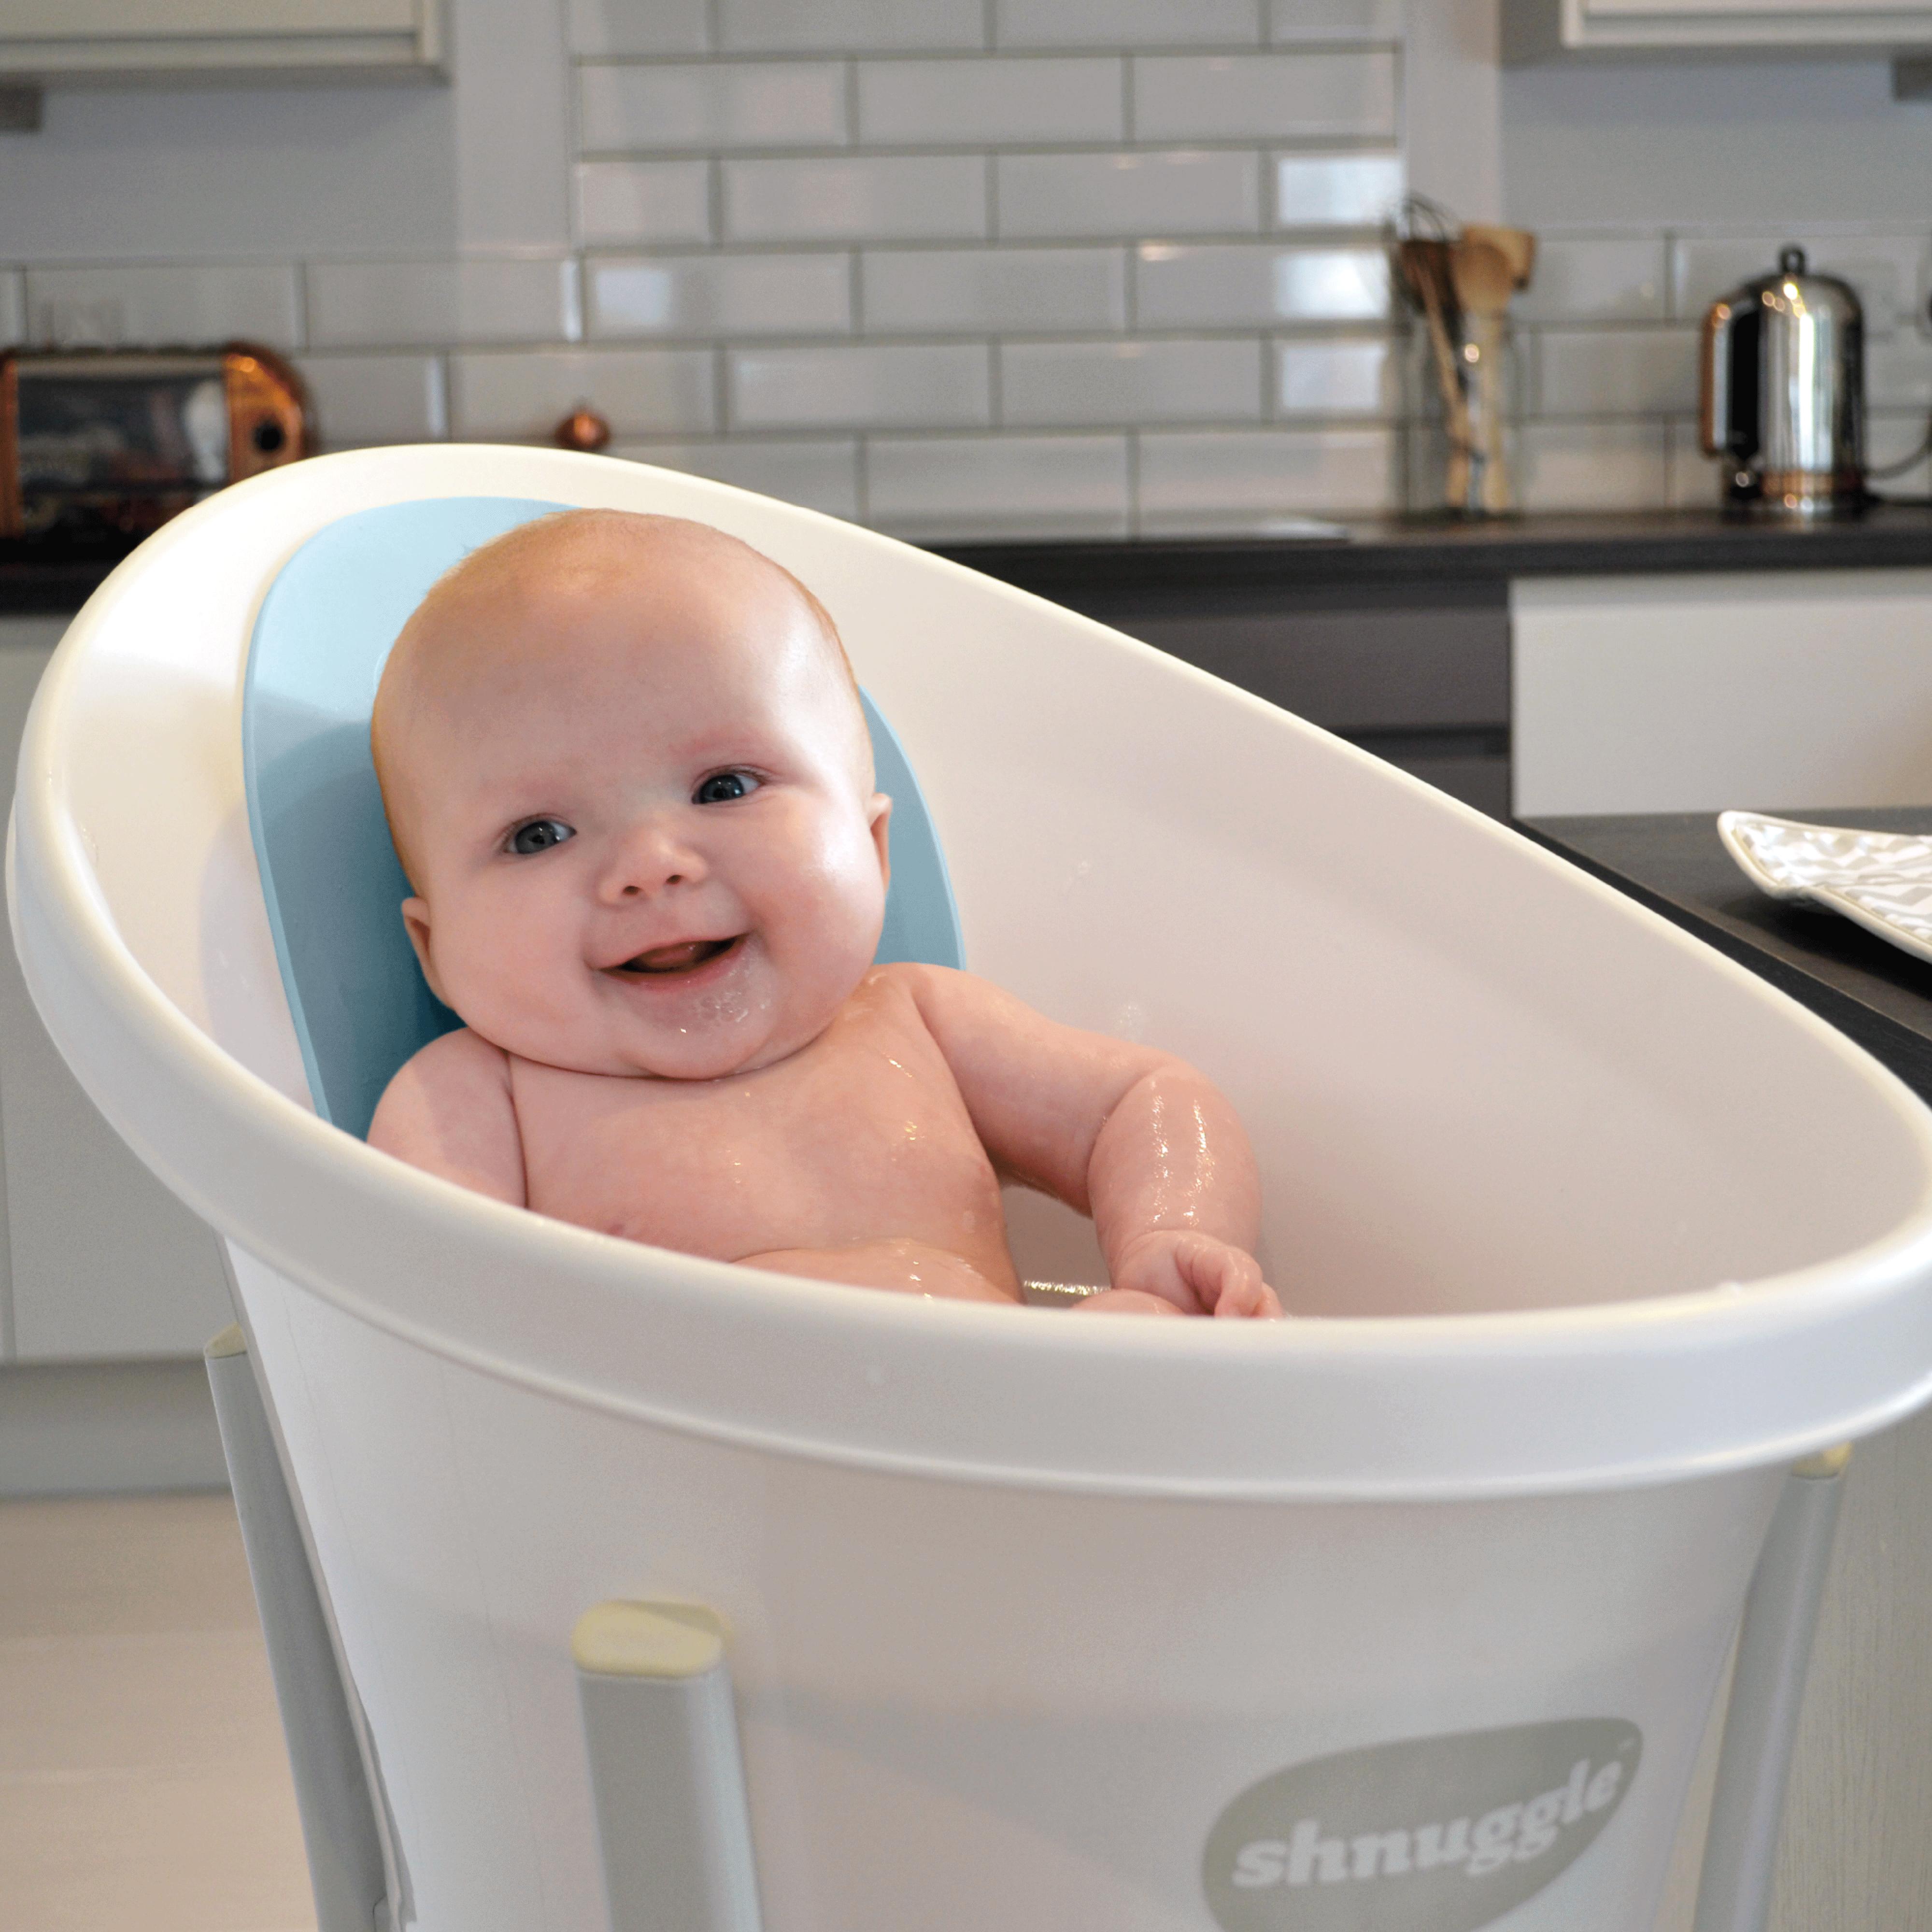 Baby in Blue Shnuggle Bath   Shnuggle - Bathtime Collection ...